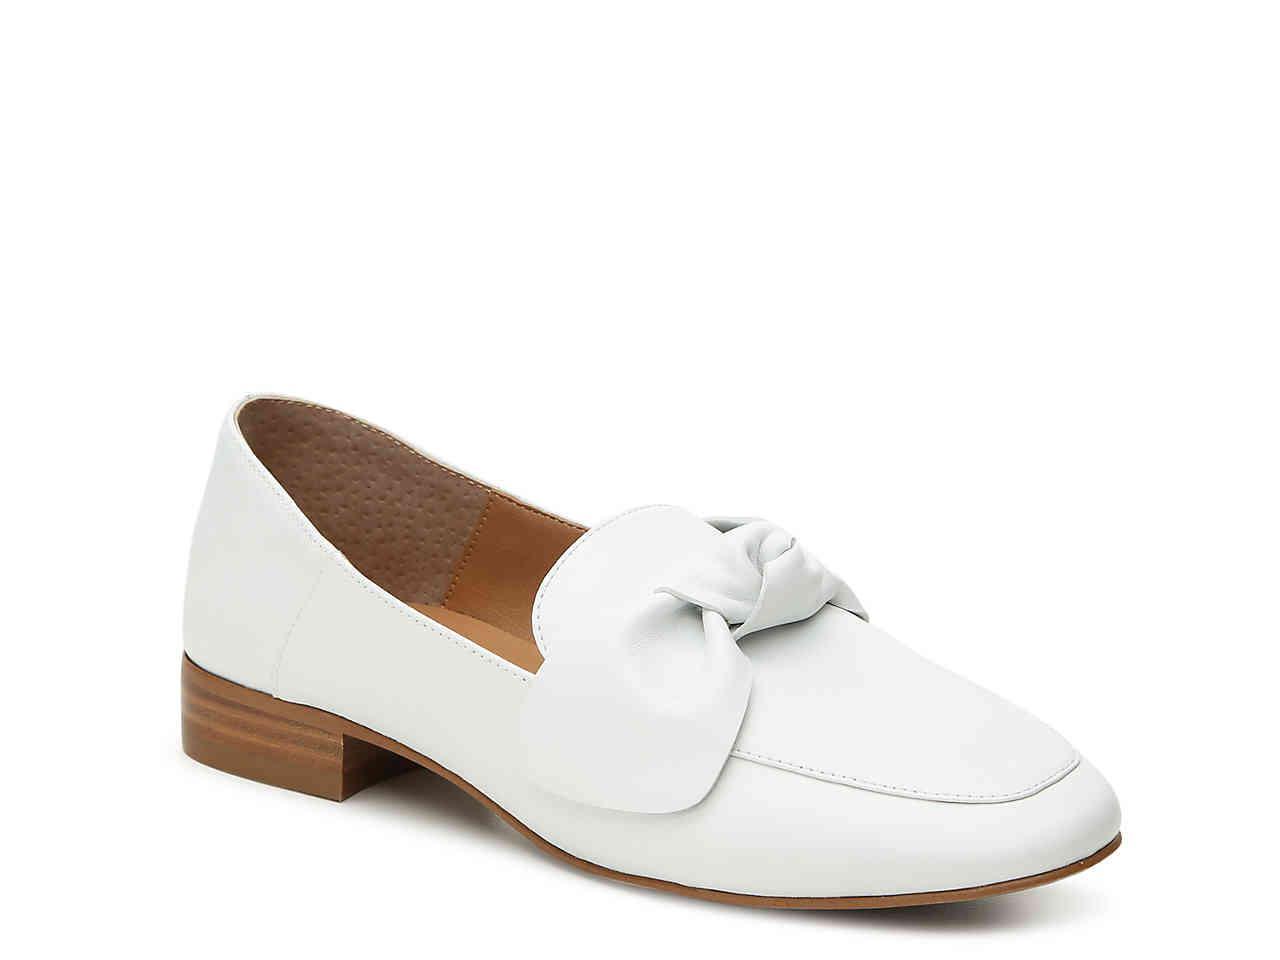 2311994ecaf Lyst franco sarto abyss loafer in white jpg 1280x960 Dsw sarto susie franco  black loafers